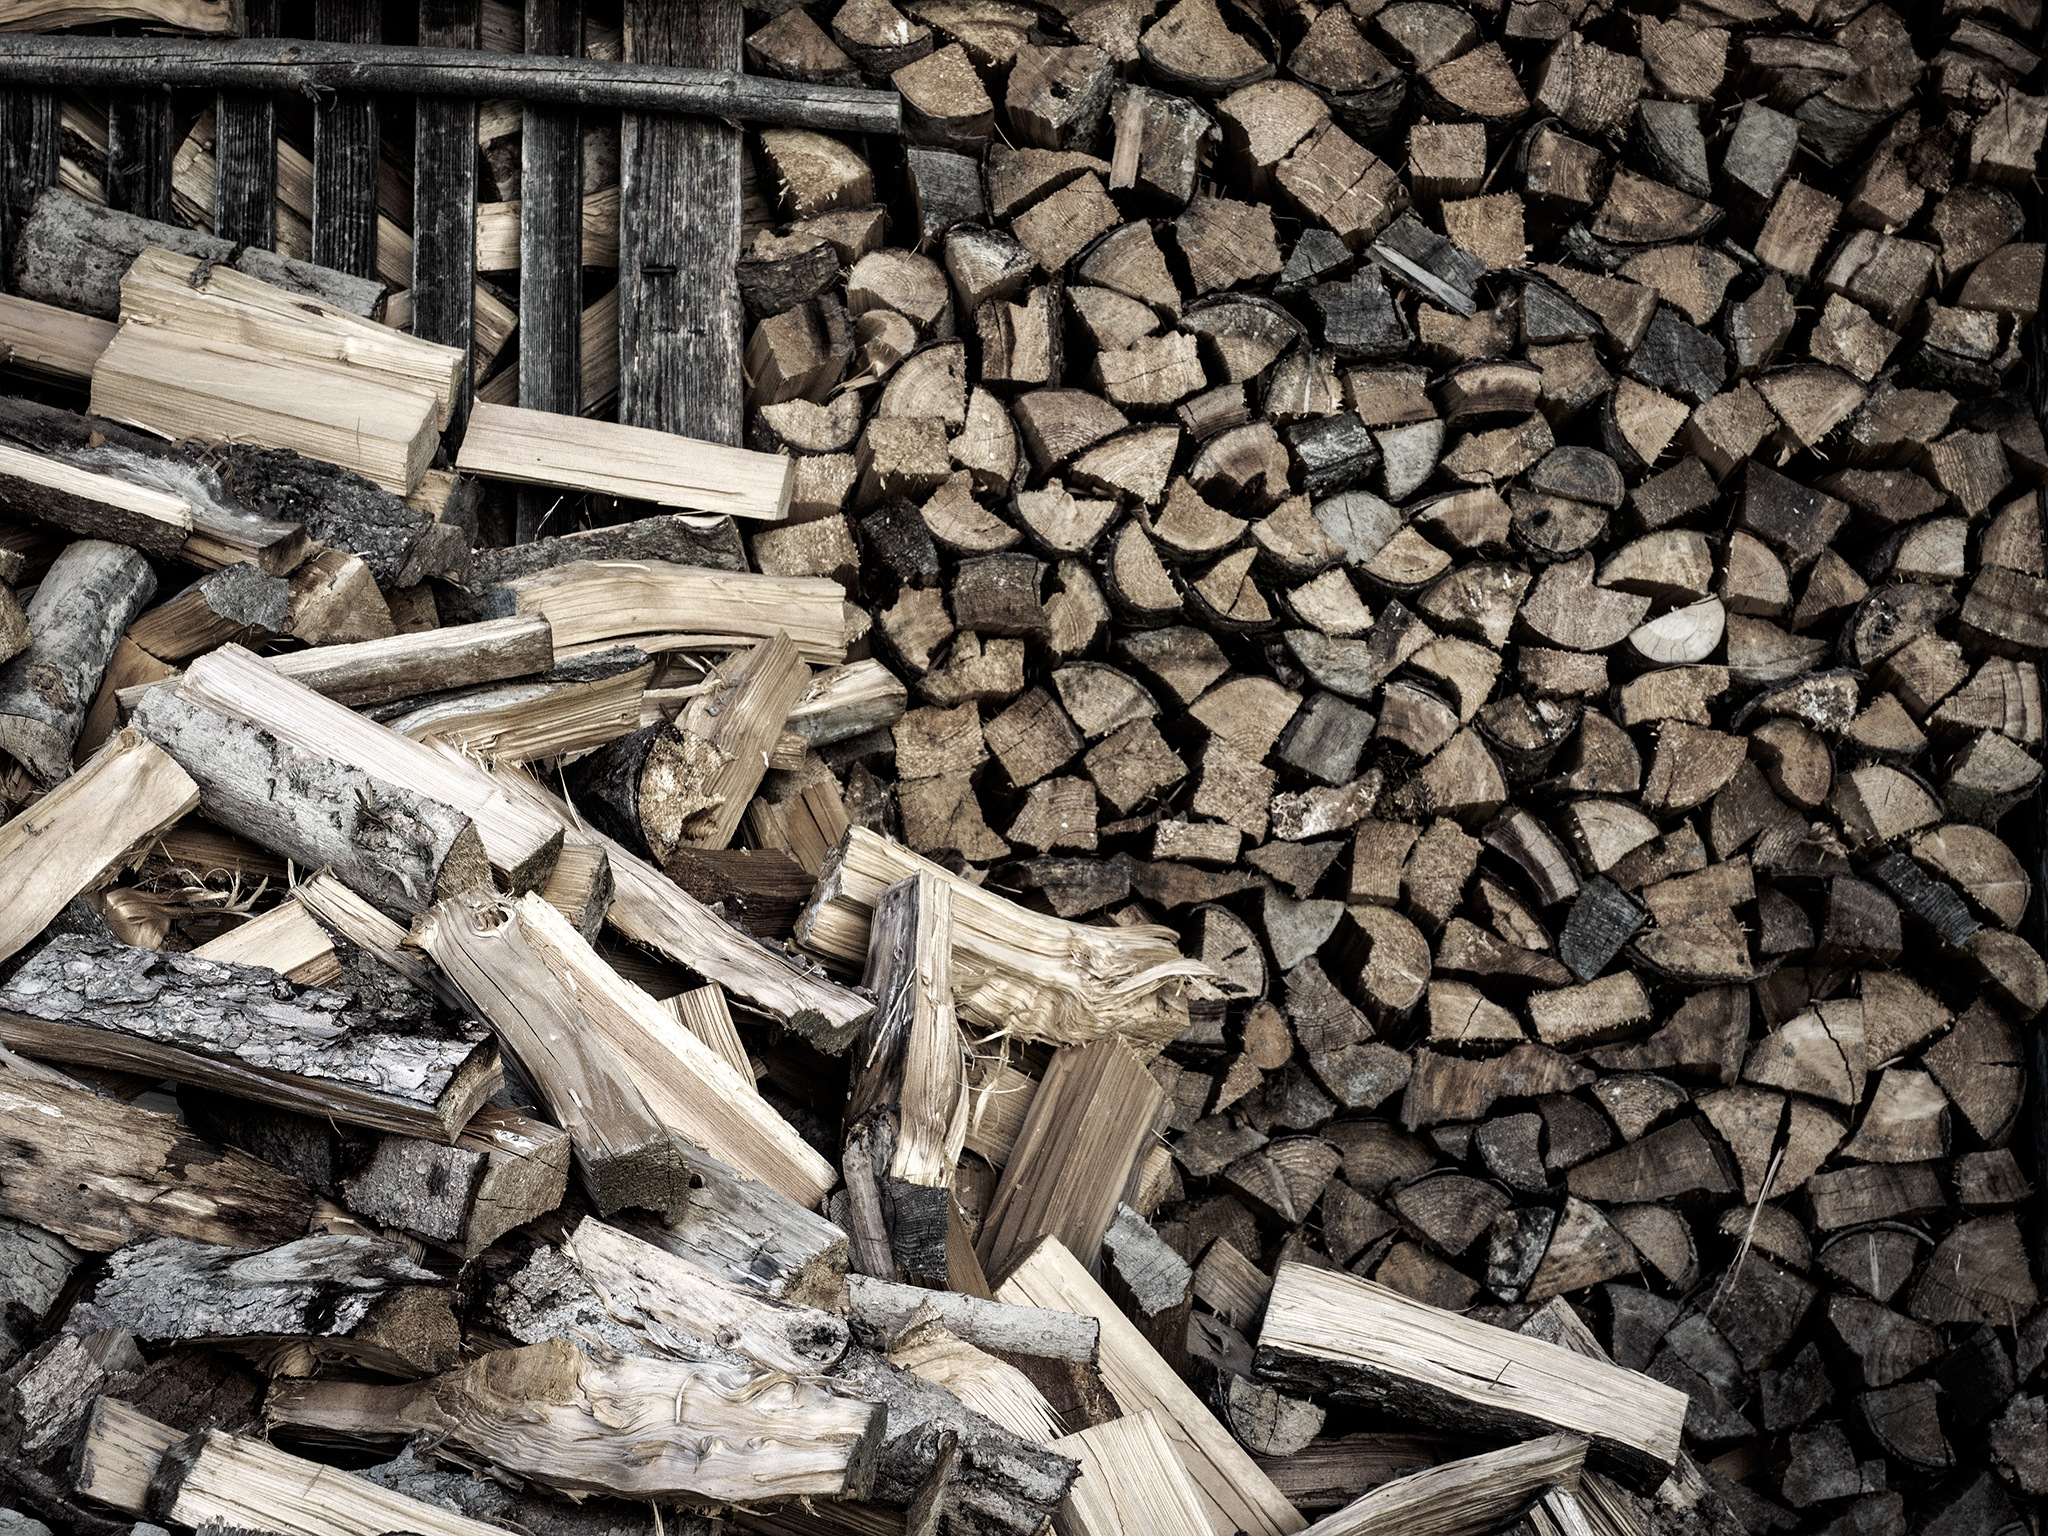 firewood by Ganesh G. Neumair